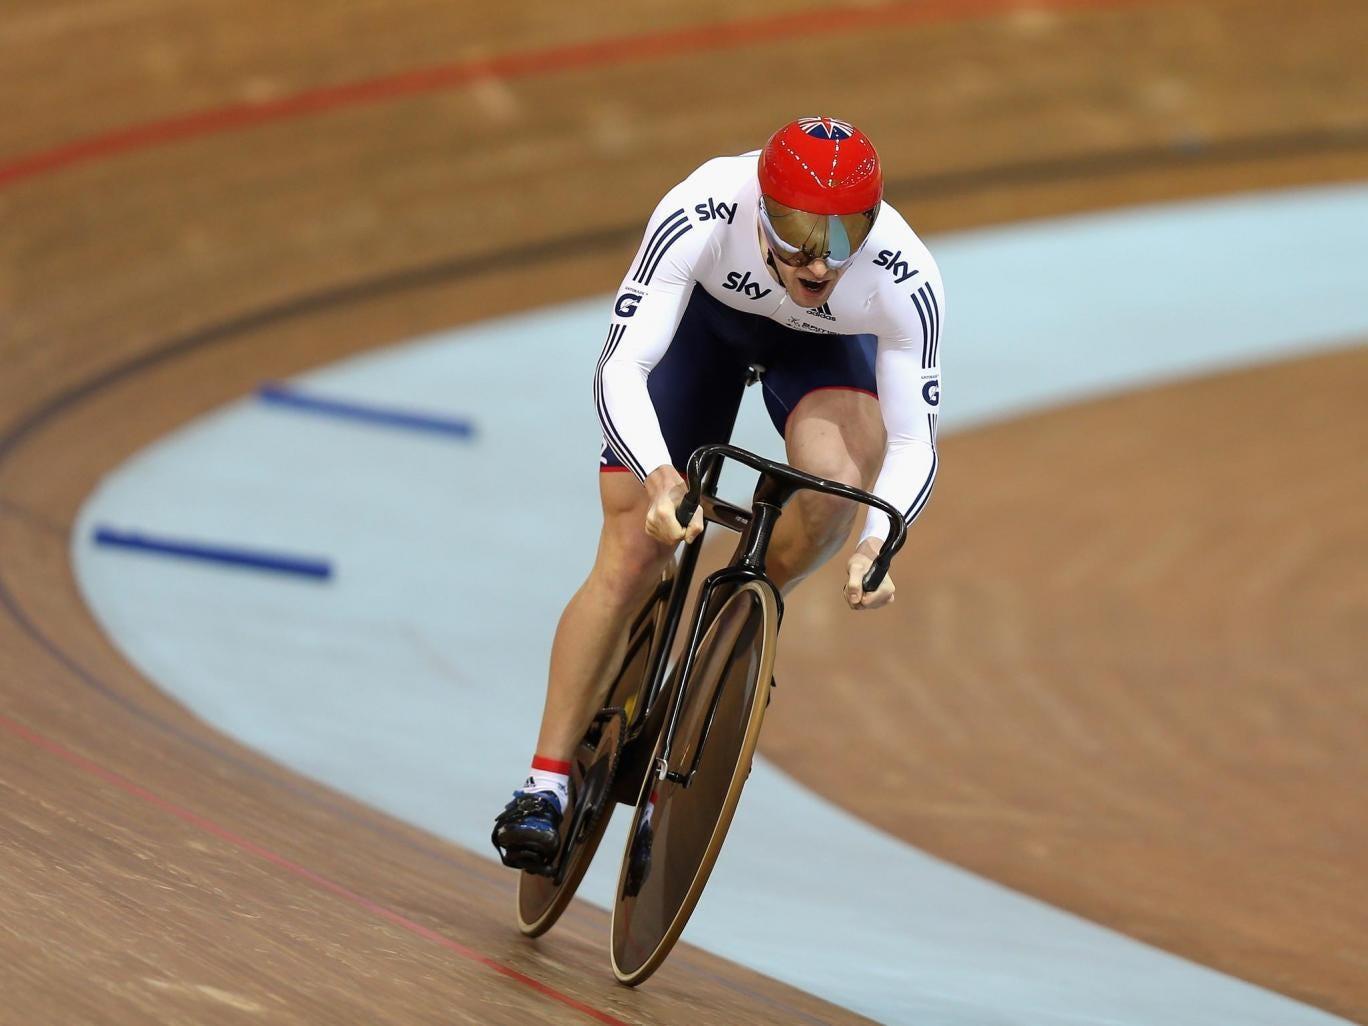 Three-time Olympic champion Jason Kenny